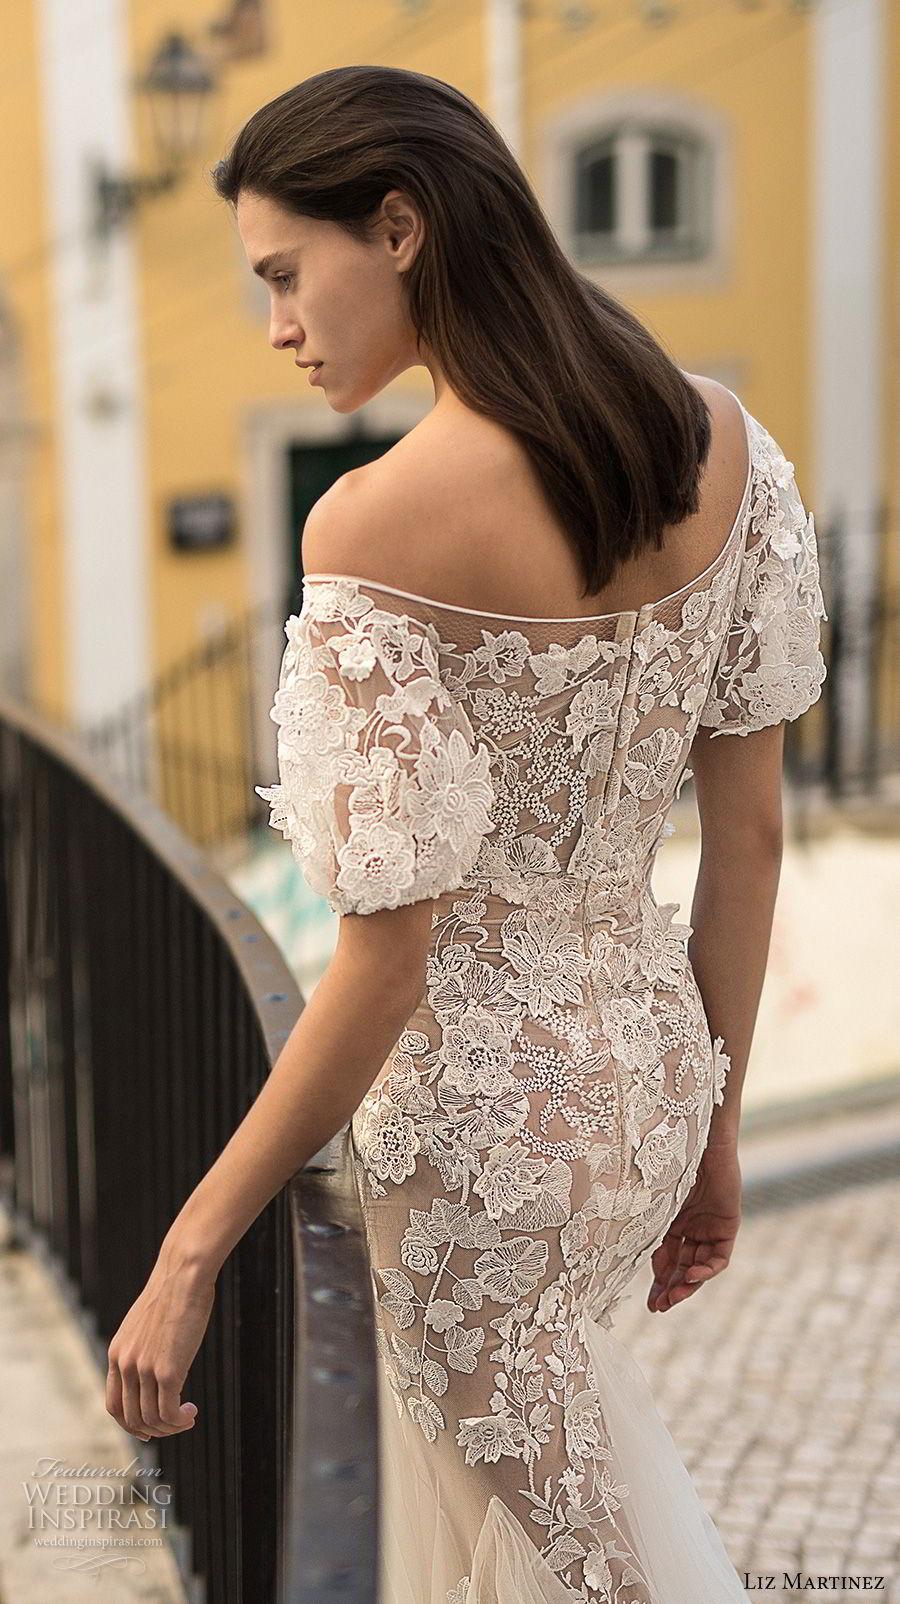 liz martinez 2018 lisbon off the shoulder sweetheart neckline full embellishment elegant romantic sheath fit and flare wedding dress (11) zbv